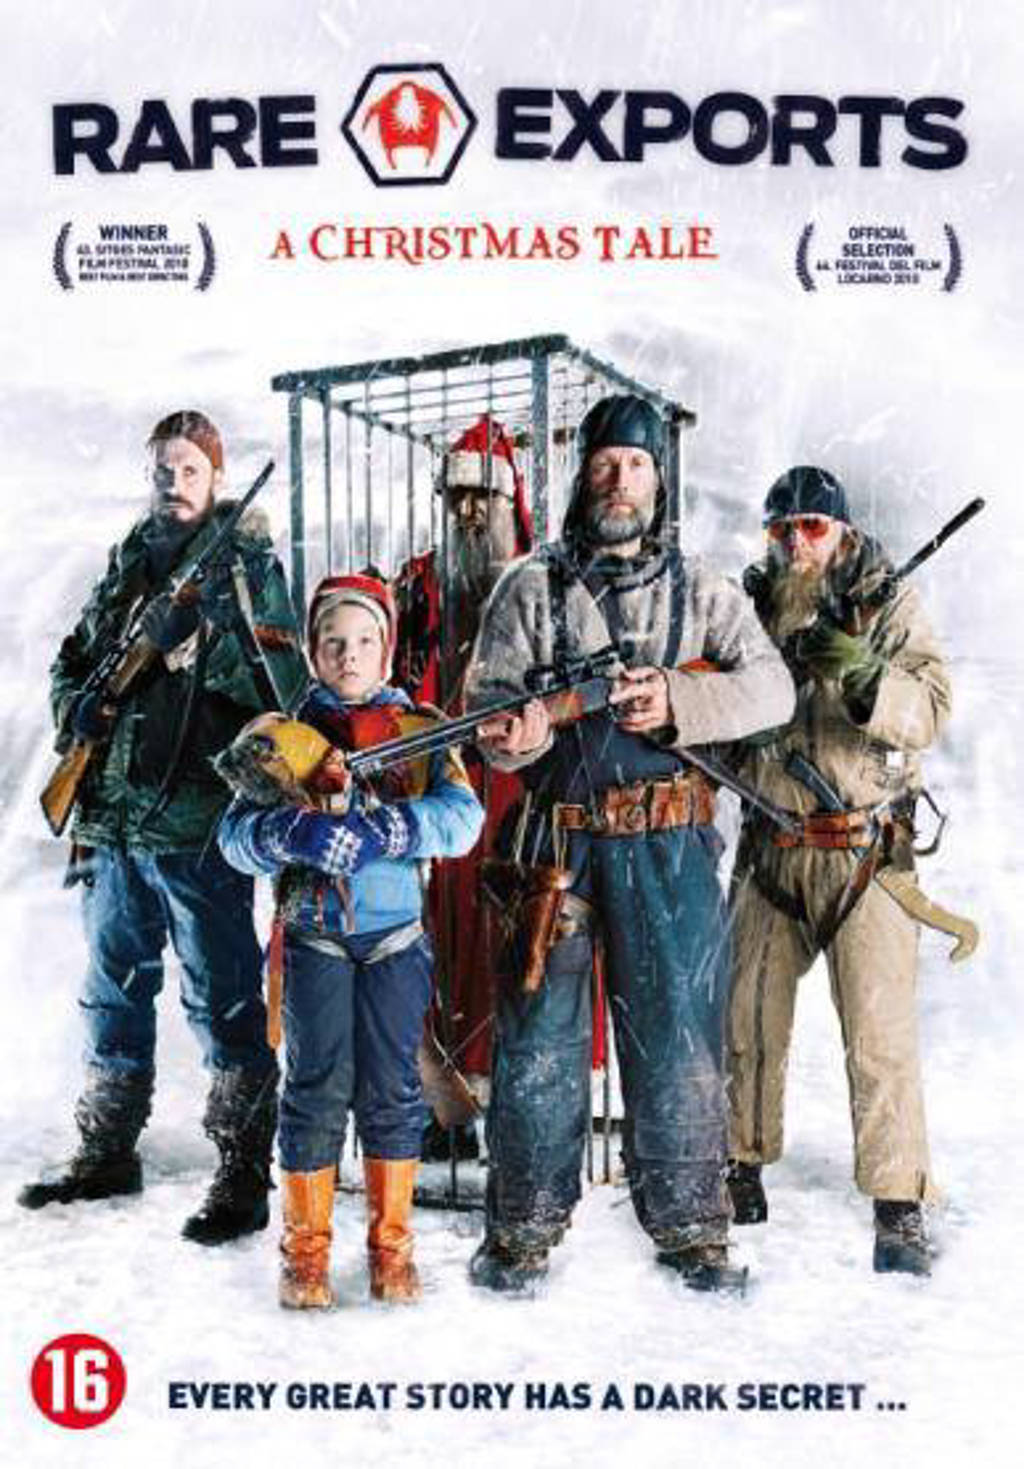 Rare exports (DVD)